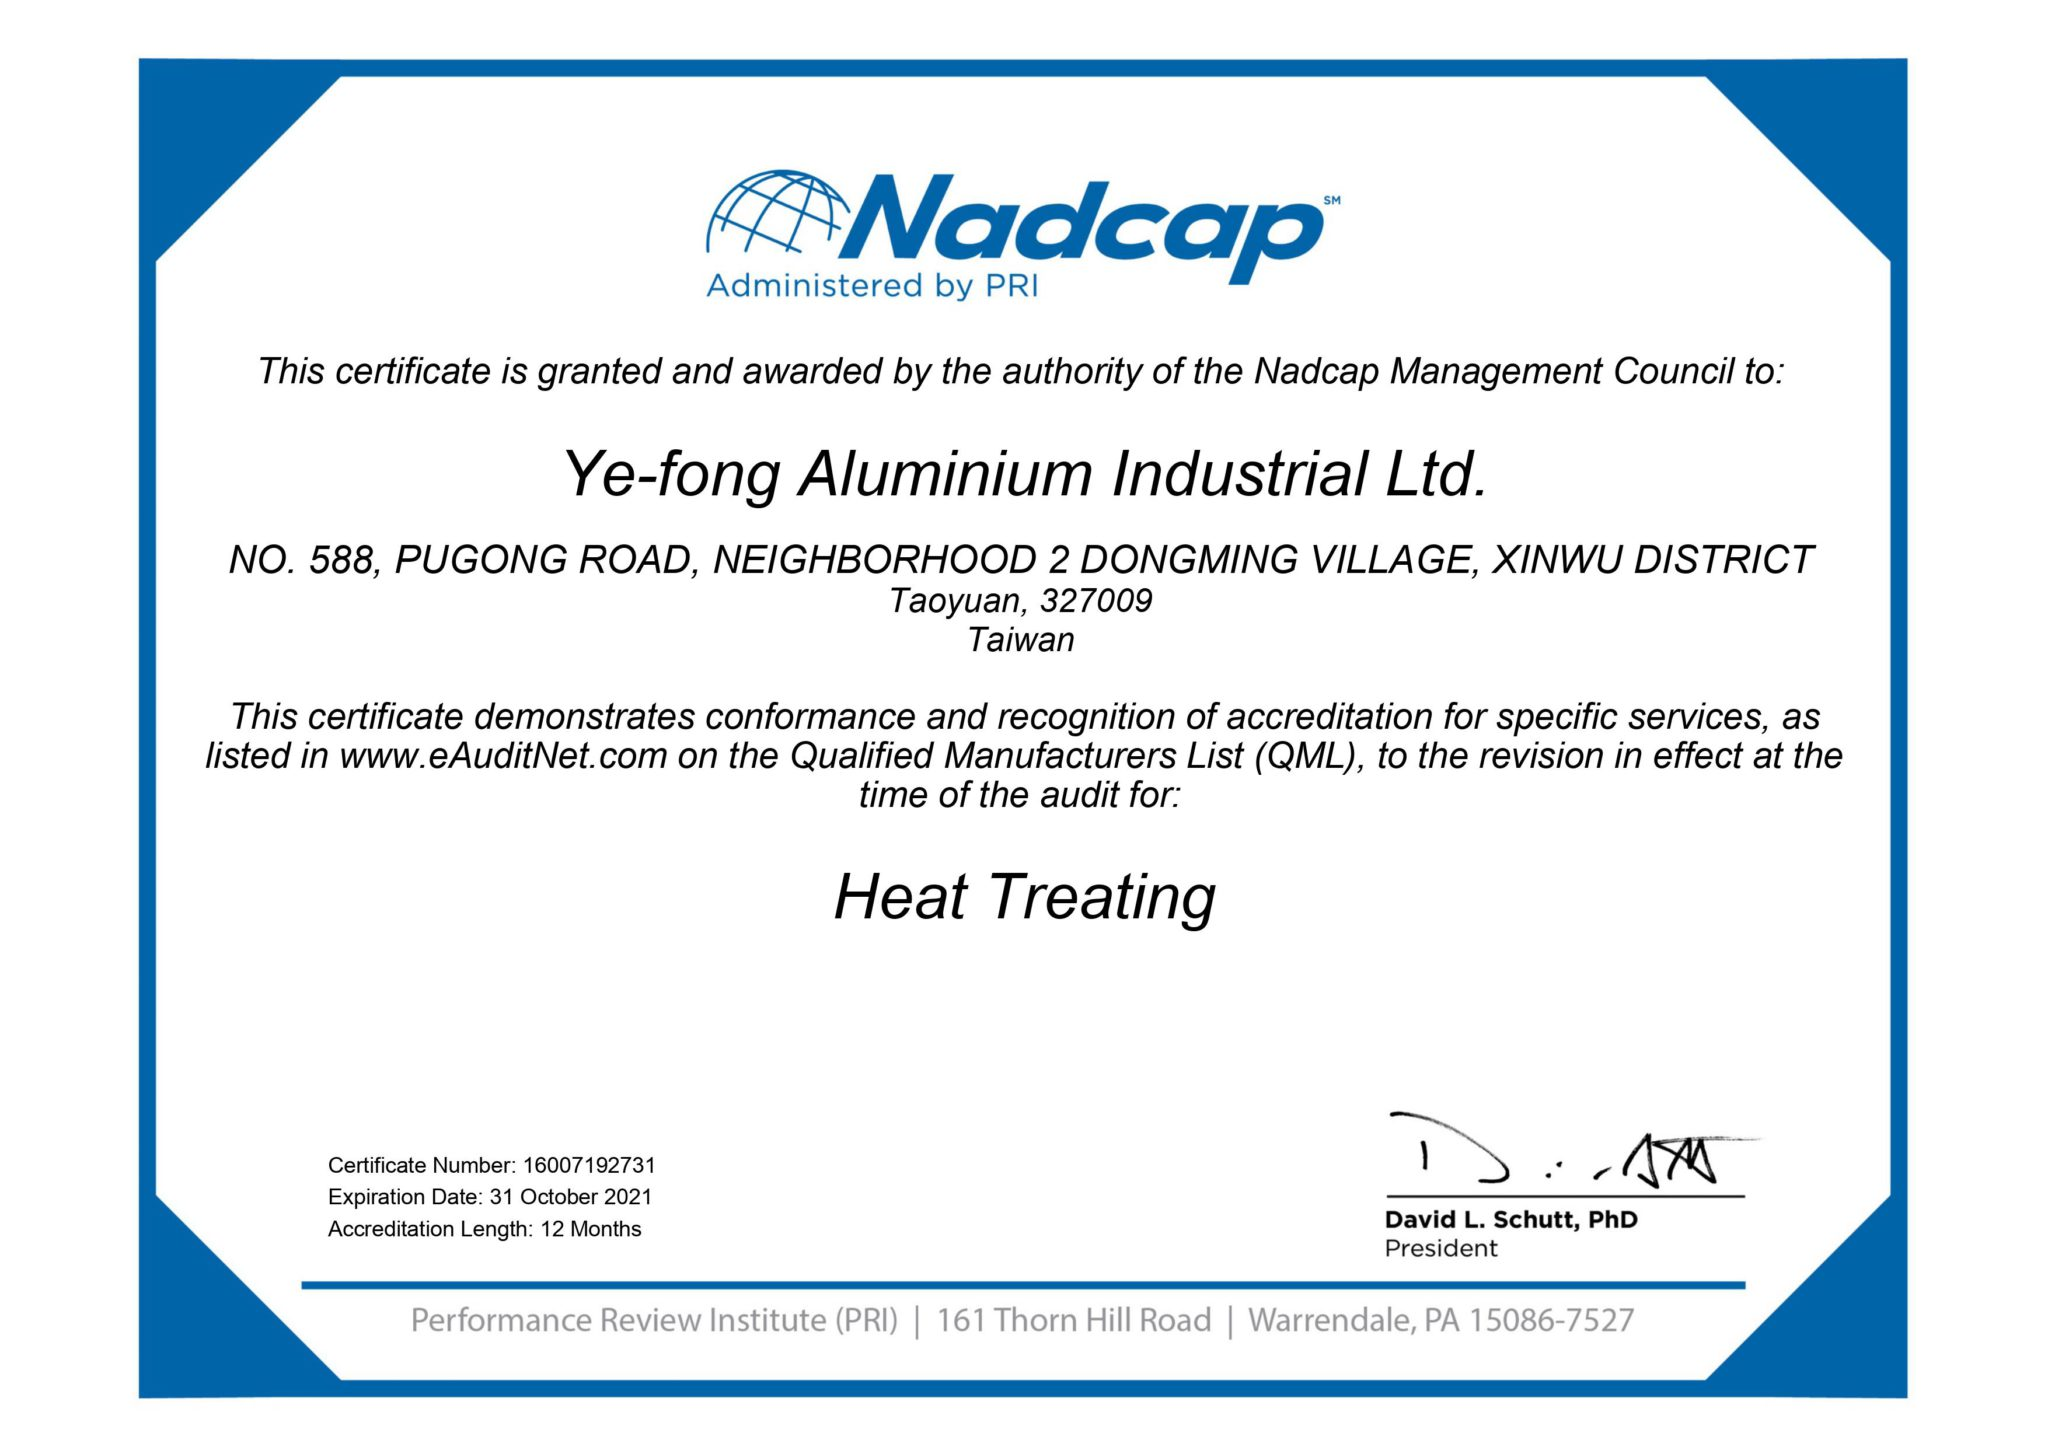 https://ye-fong.com/wp-content/uploads/2021/07/Ye-Fong-NADCAP-for-Heat-Treating-scaled.jpg